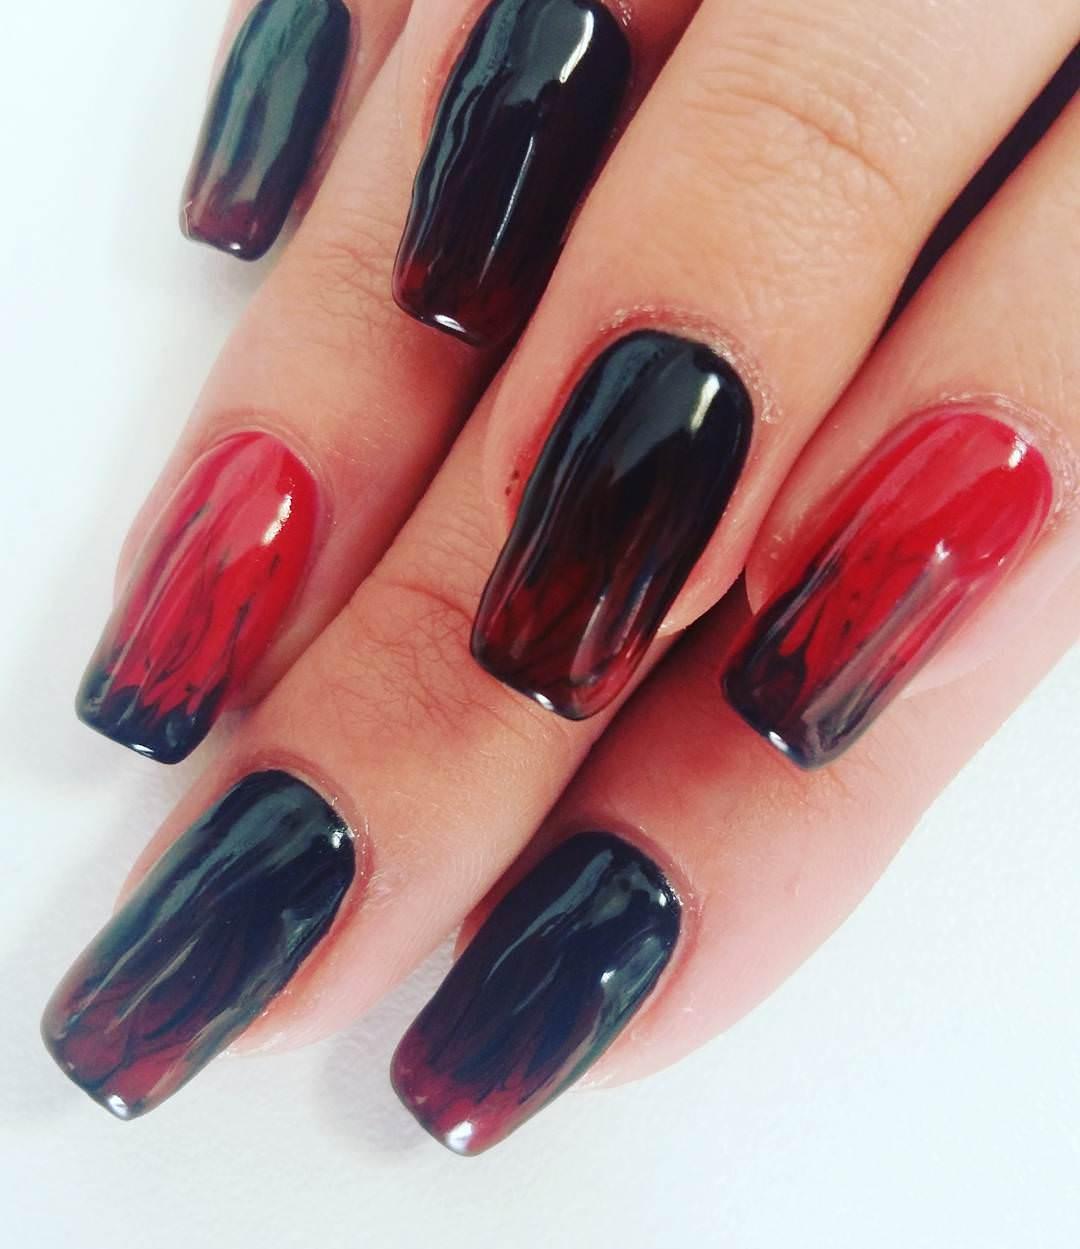 Nail art whitby best nails art ideas prinsesfo Choice Image